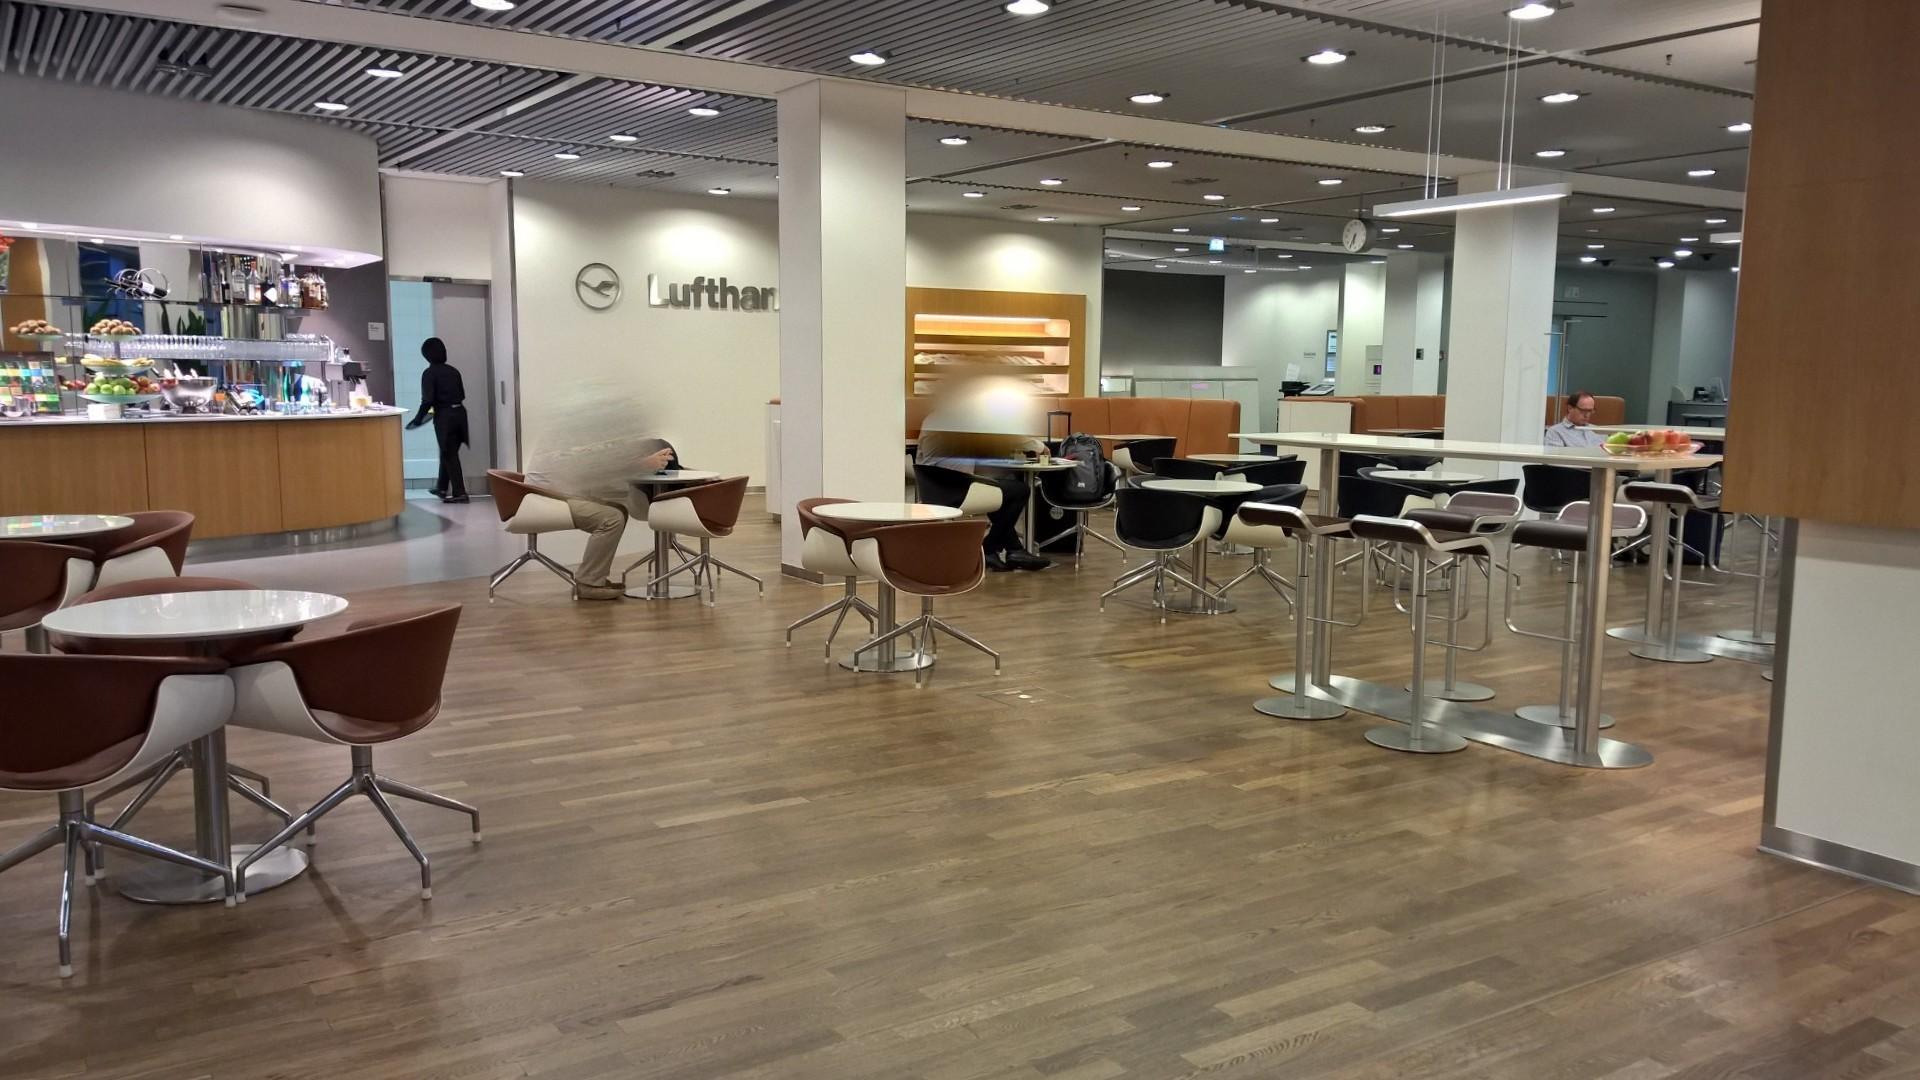 Frankfurt Airport Senator Lounge Lufthansa